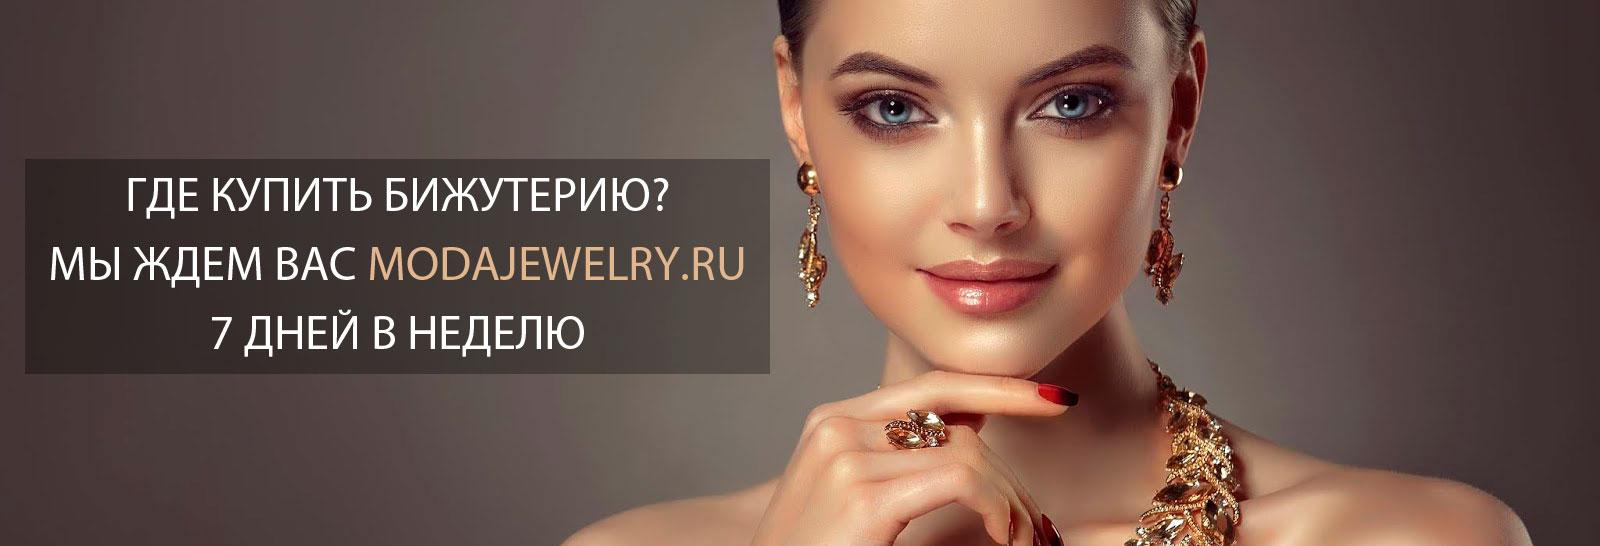 Где купить бижутерию modajewelry fallon xuping